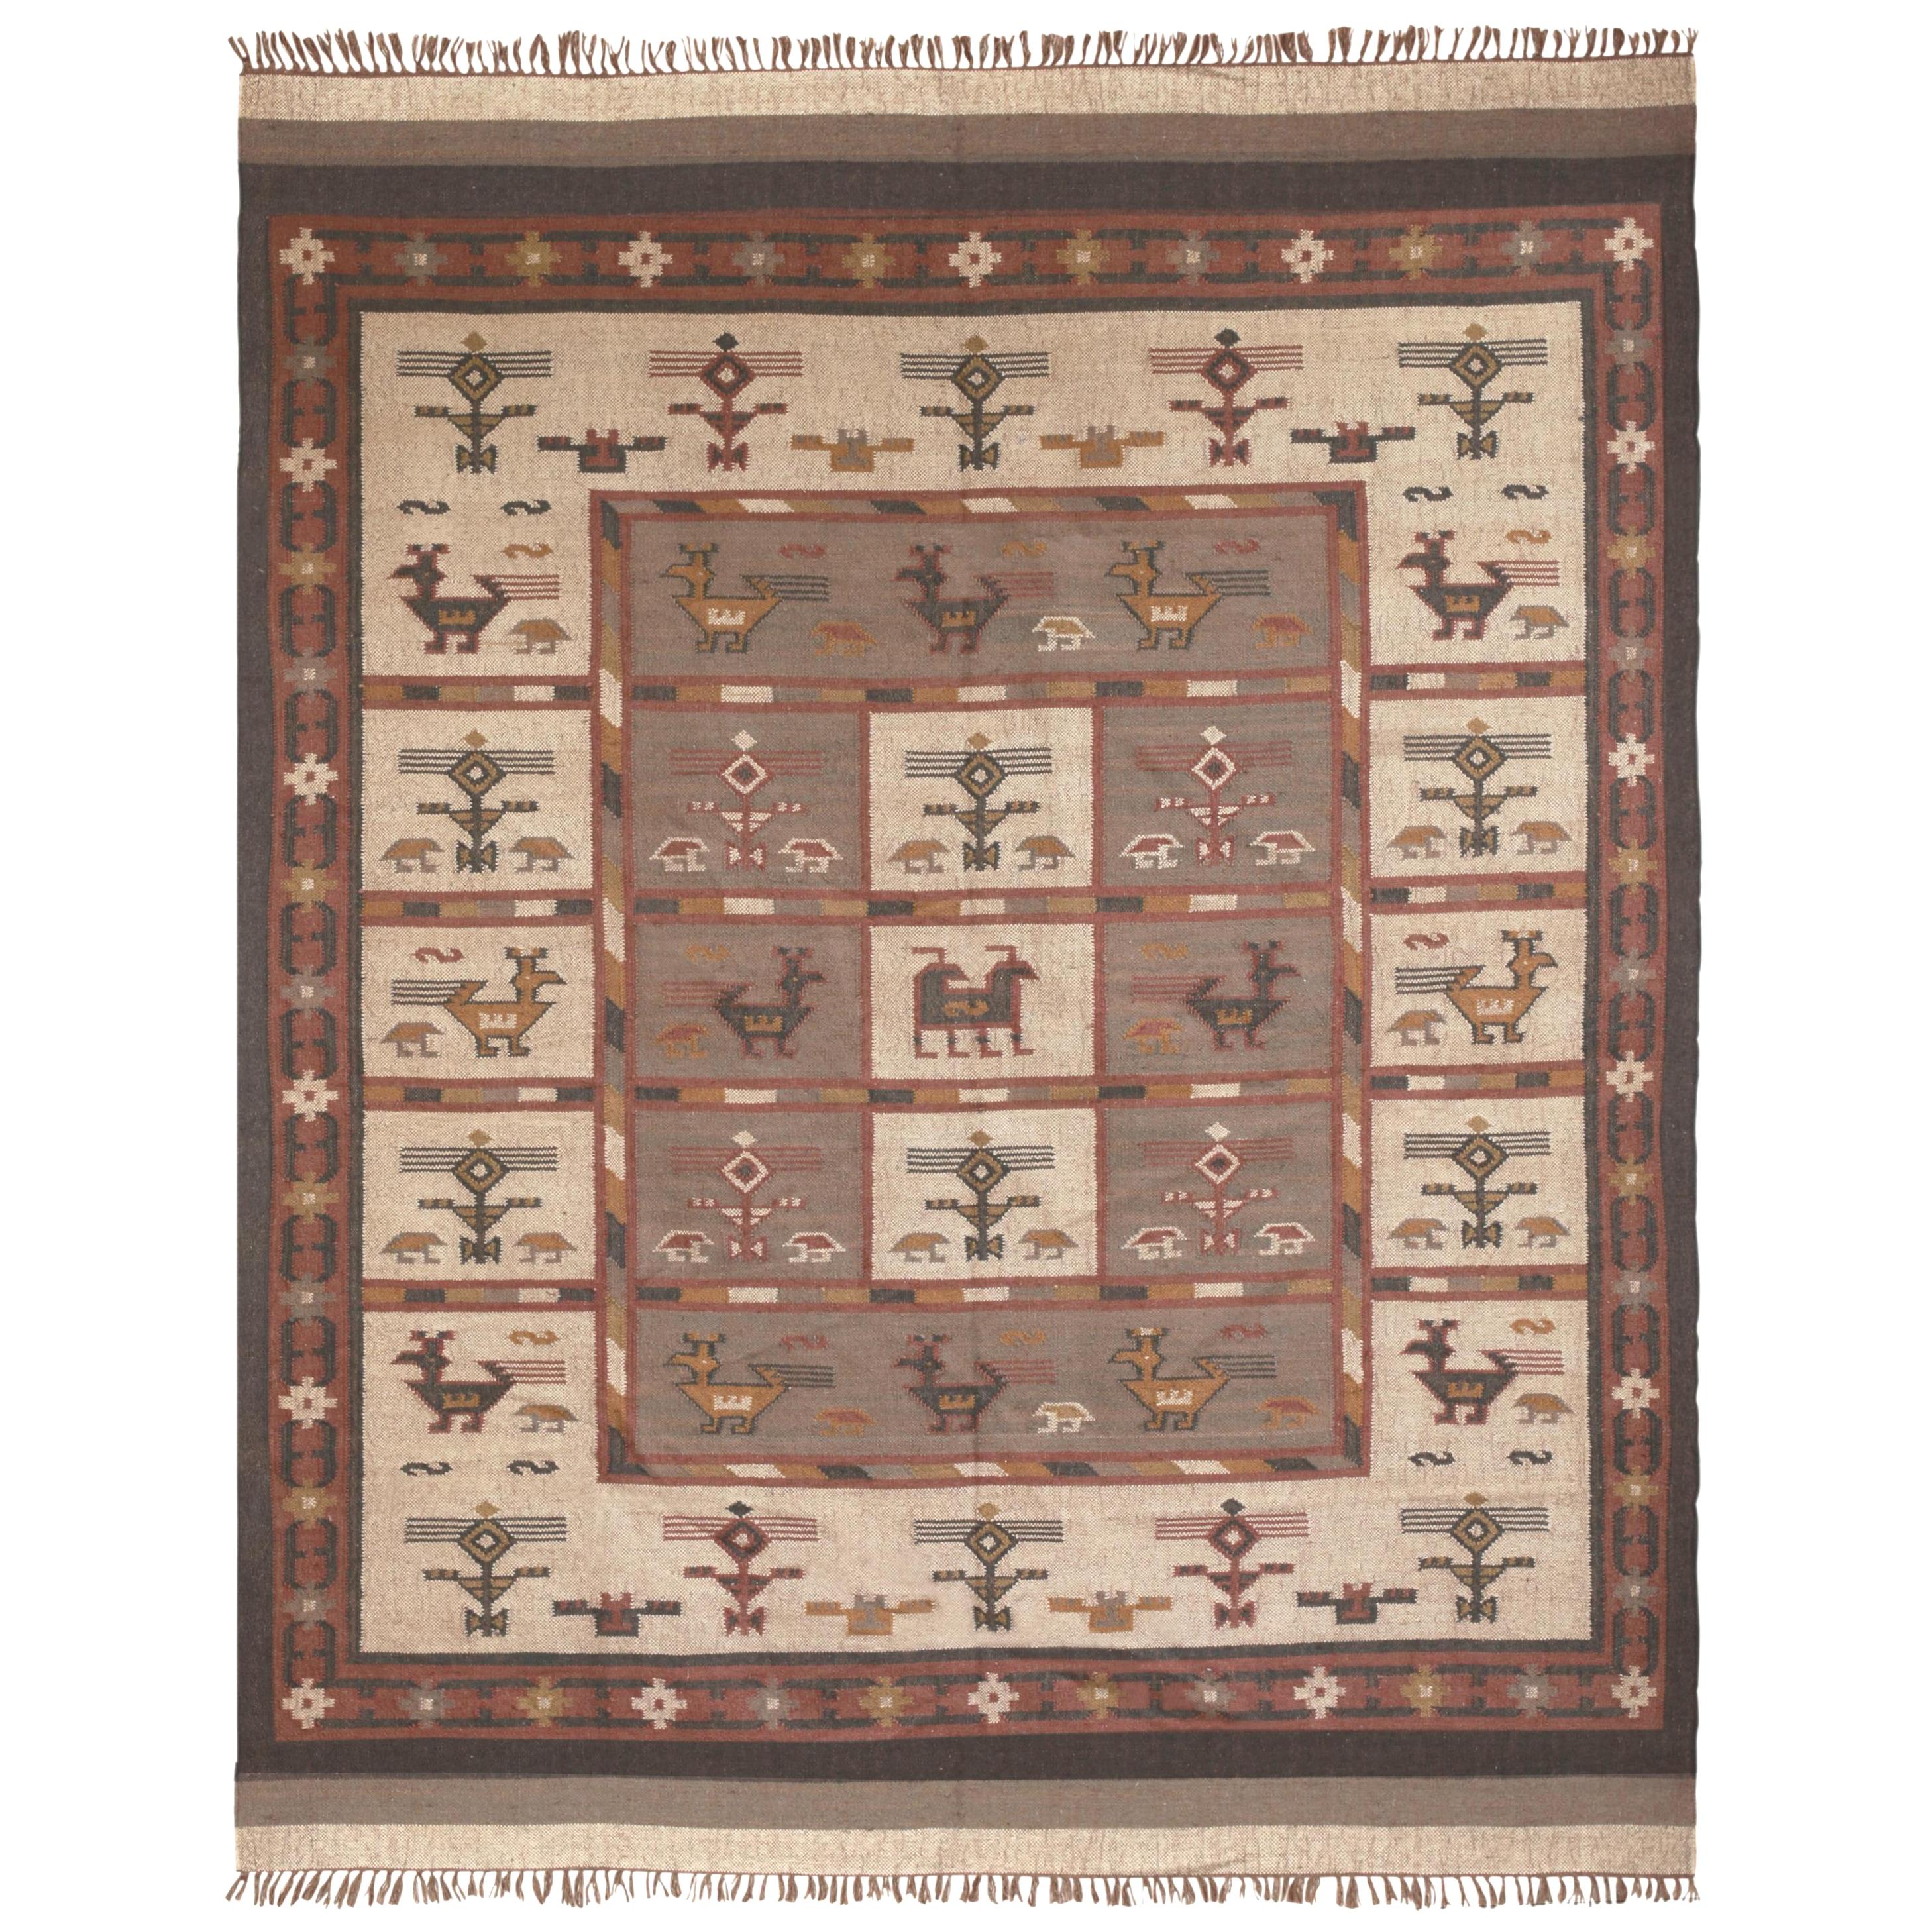 Flat Woven Off White Tribal Jute Wool Rug (12x18) - 12 x 18 (White - 12 x 18)